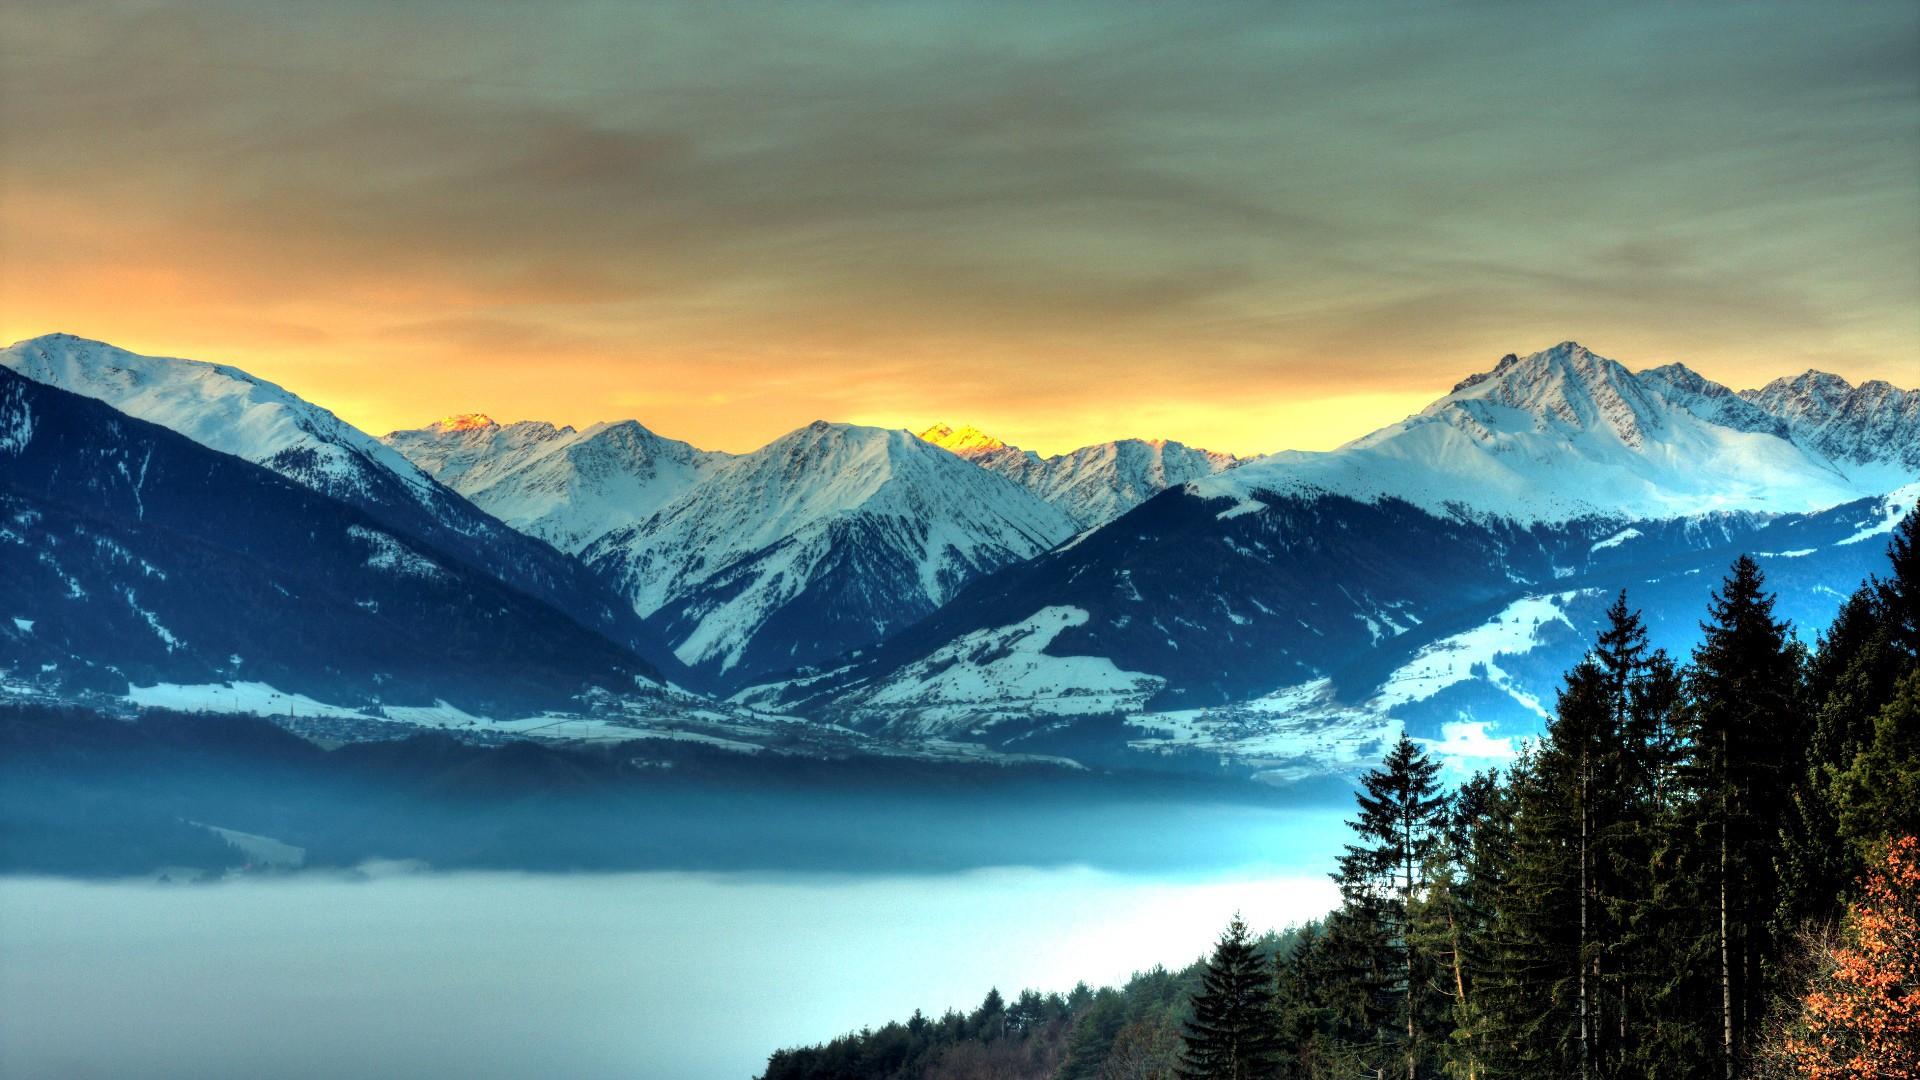 43 high definition mountain wallpaper on wallpapersafari - Wallpaper definition ...